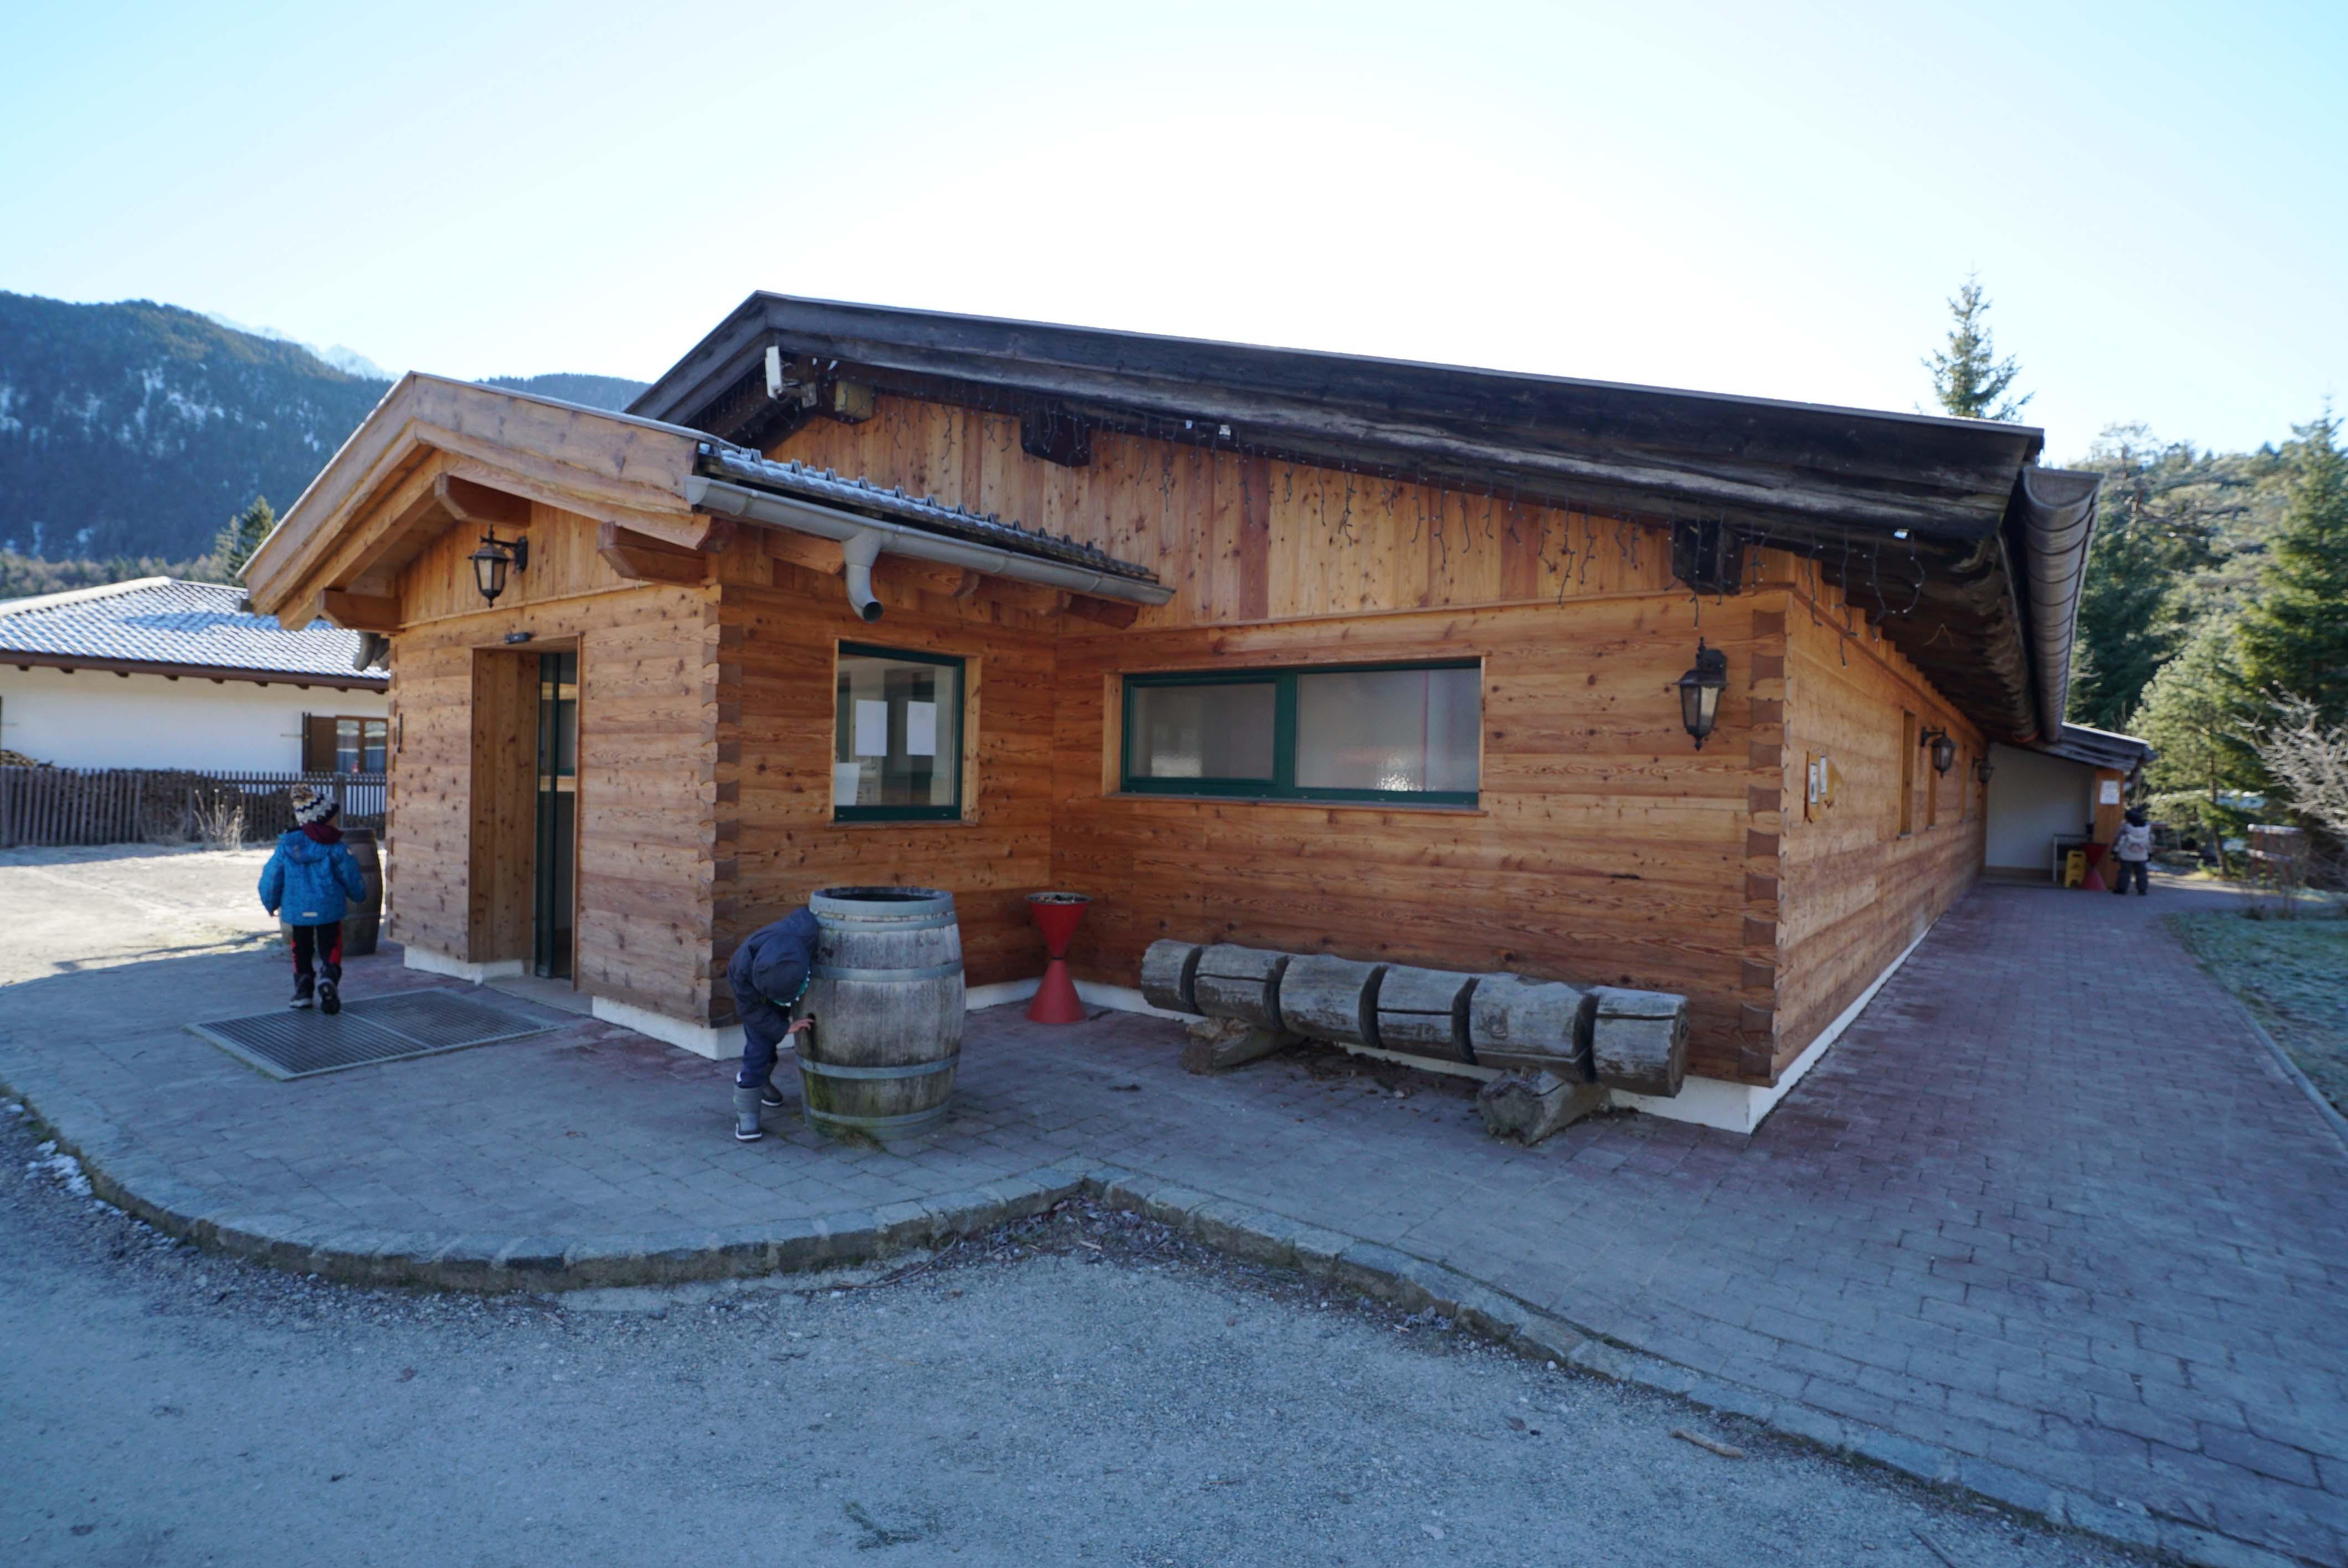 Naturcampingpark Isarhorn04